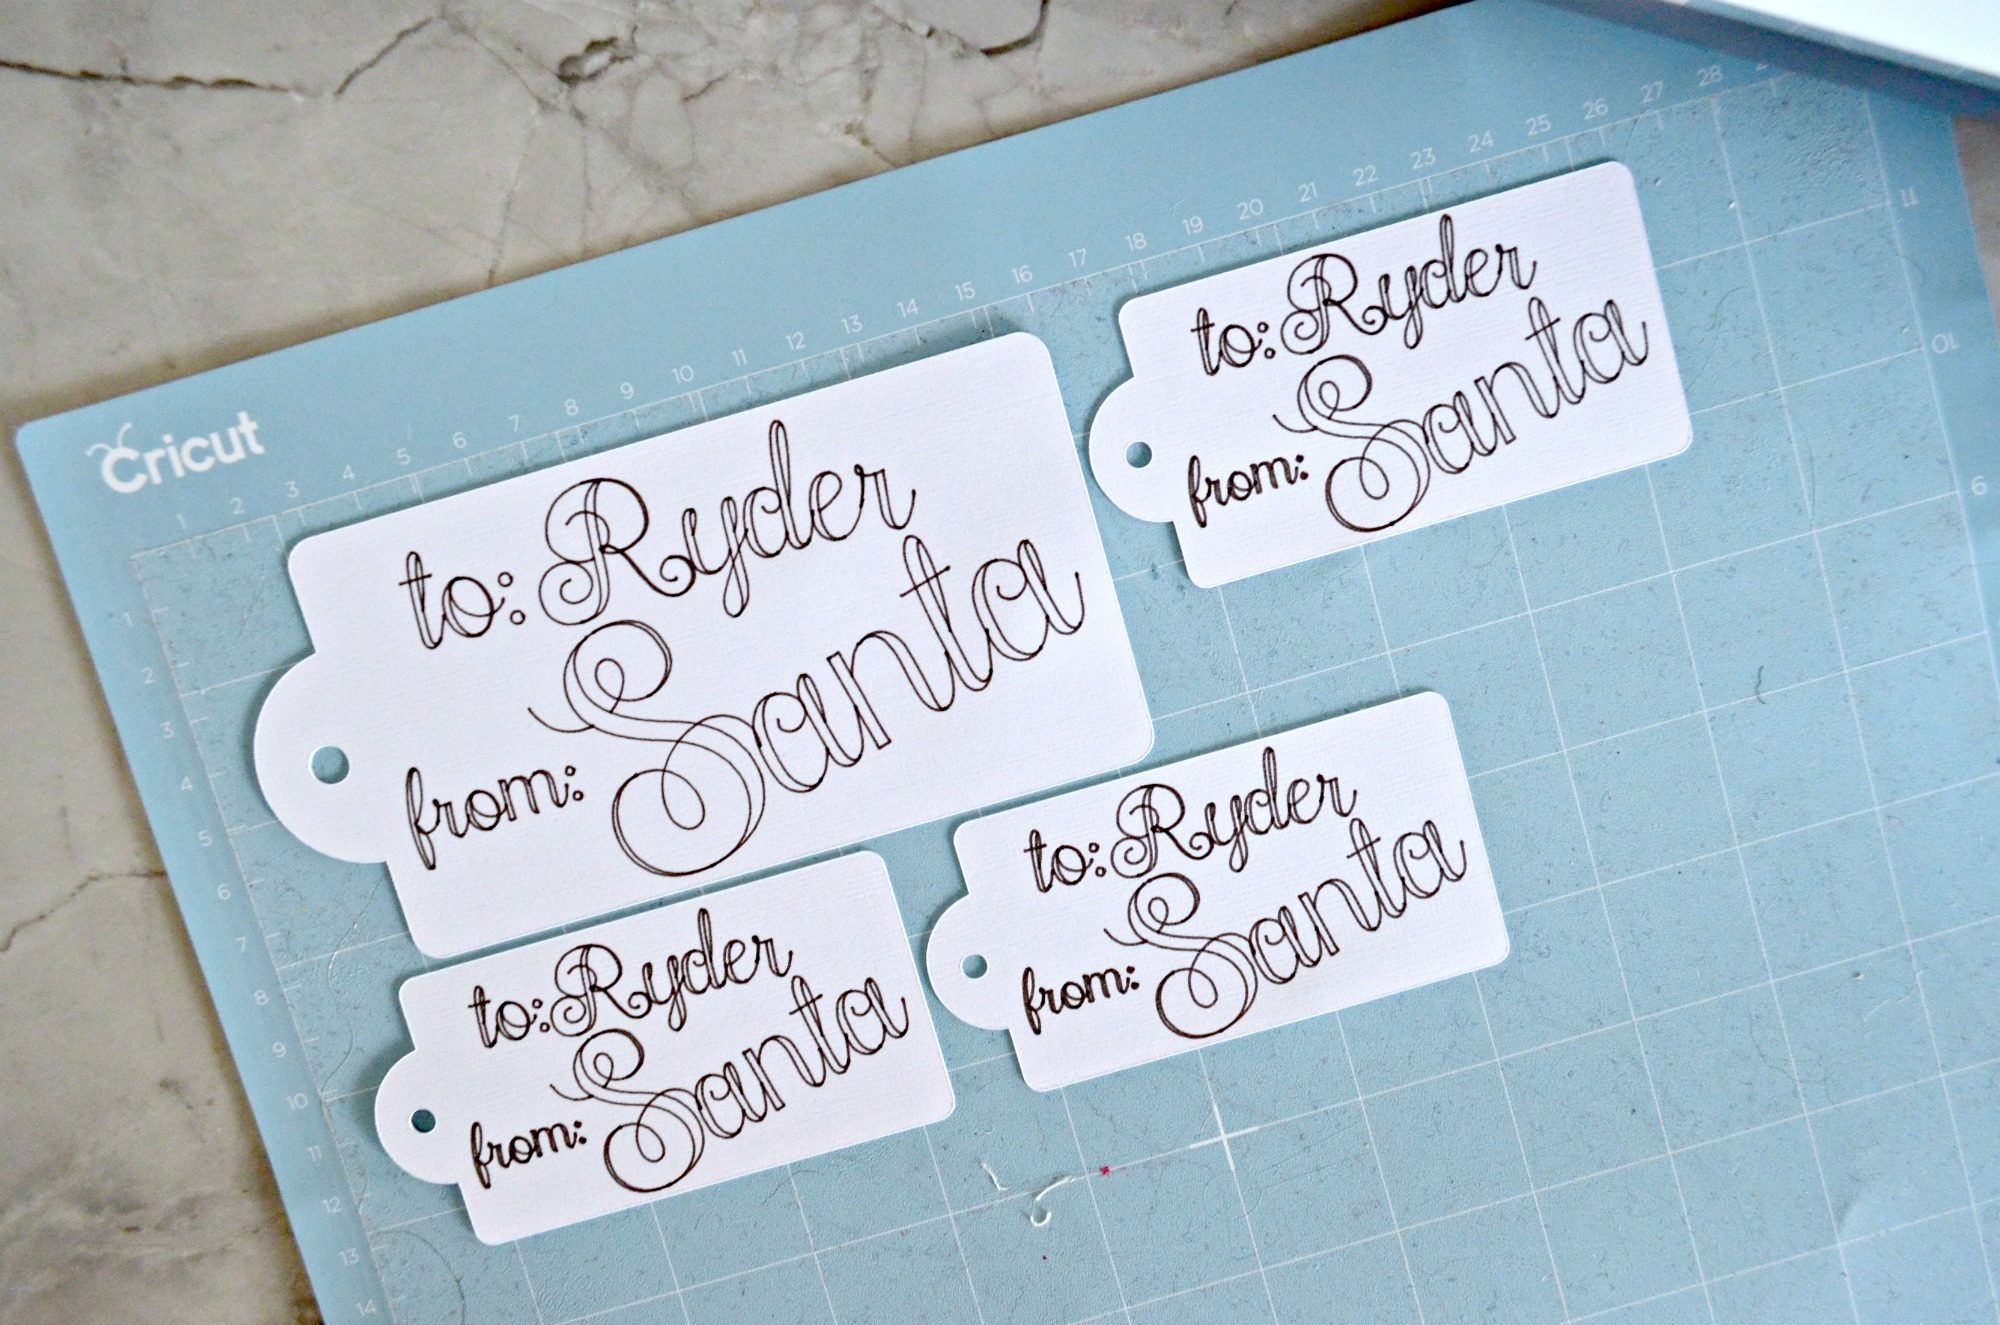 DIY Handwritten Santa Gift Tags on Cricut Mat